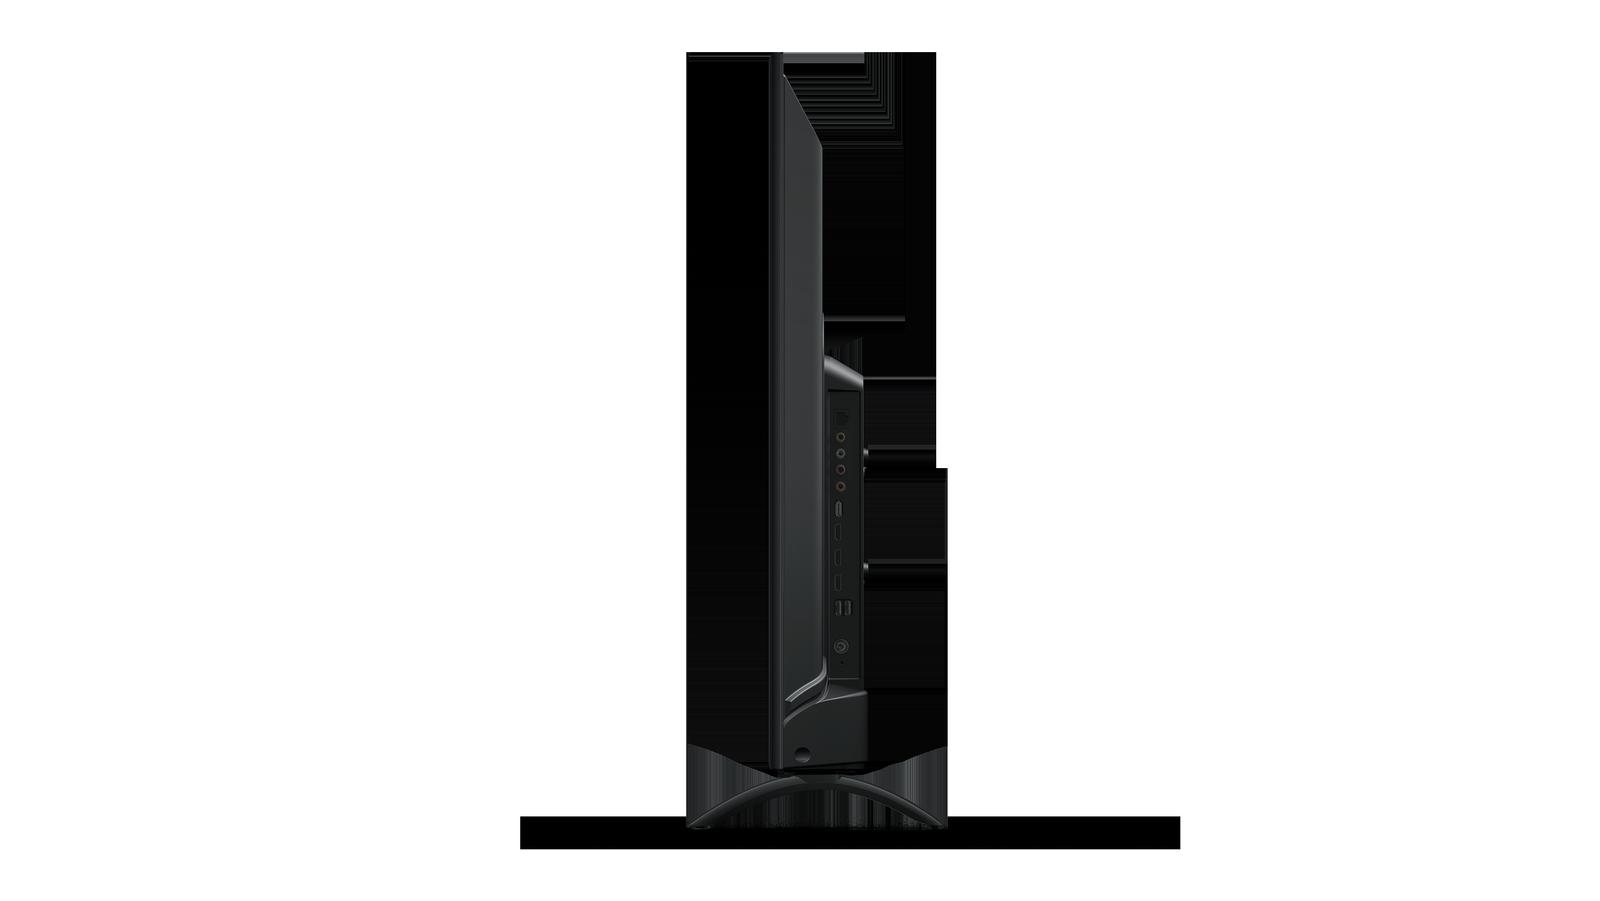 Kodak 43-inch UHDX 4K Smart TV vs Xiaomi 43-inch Mi LED TV